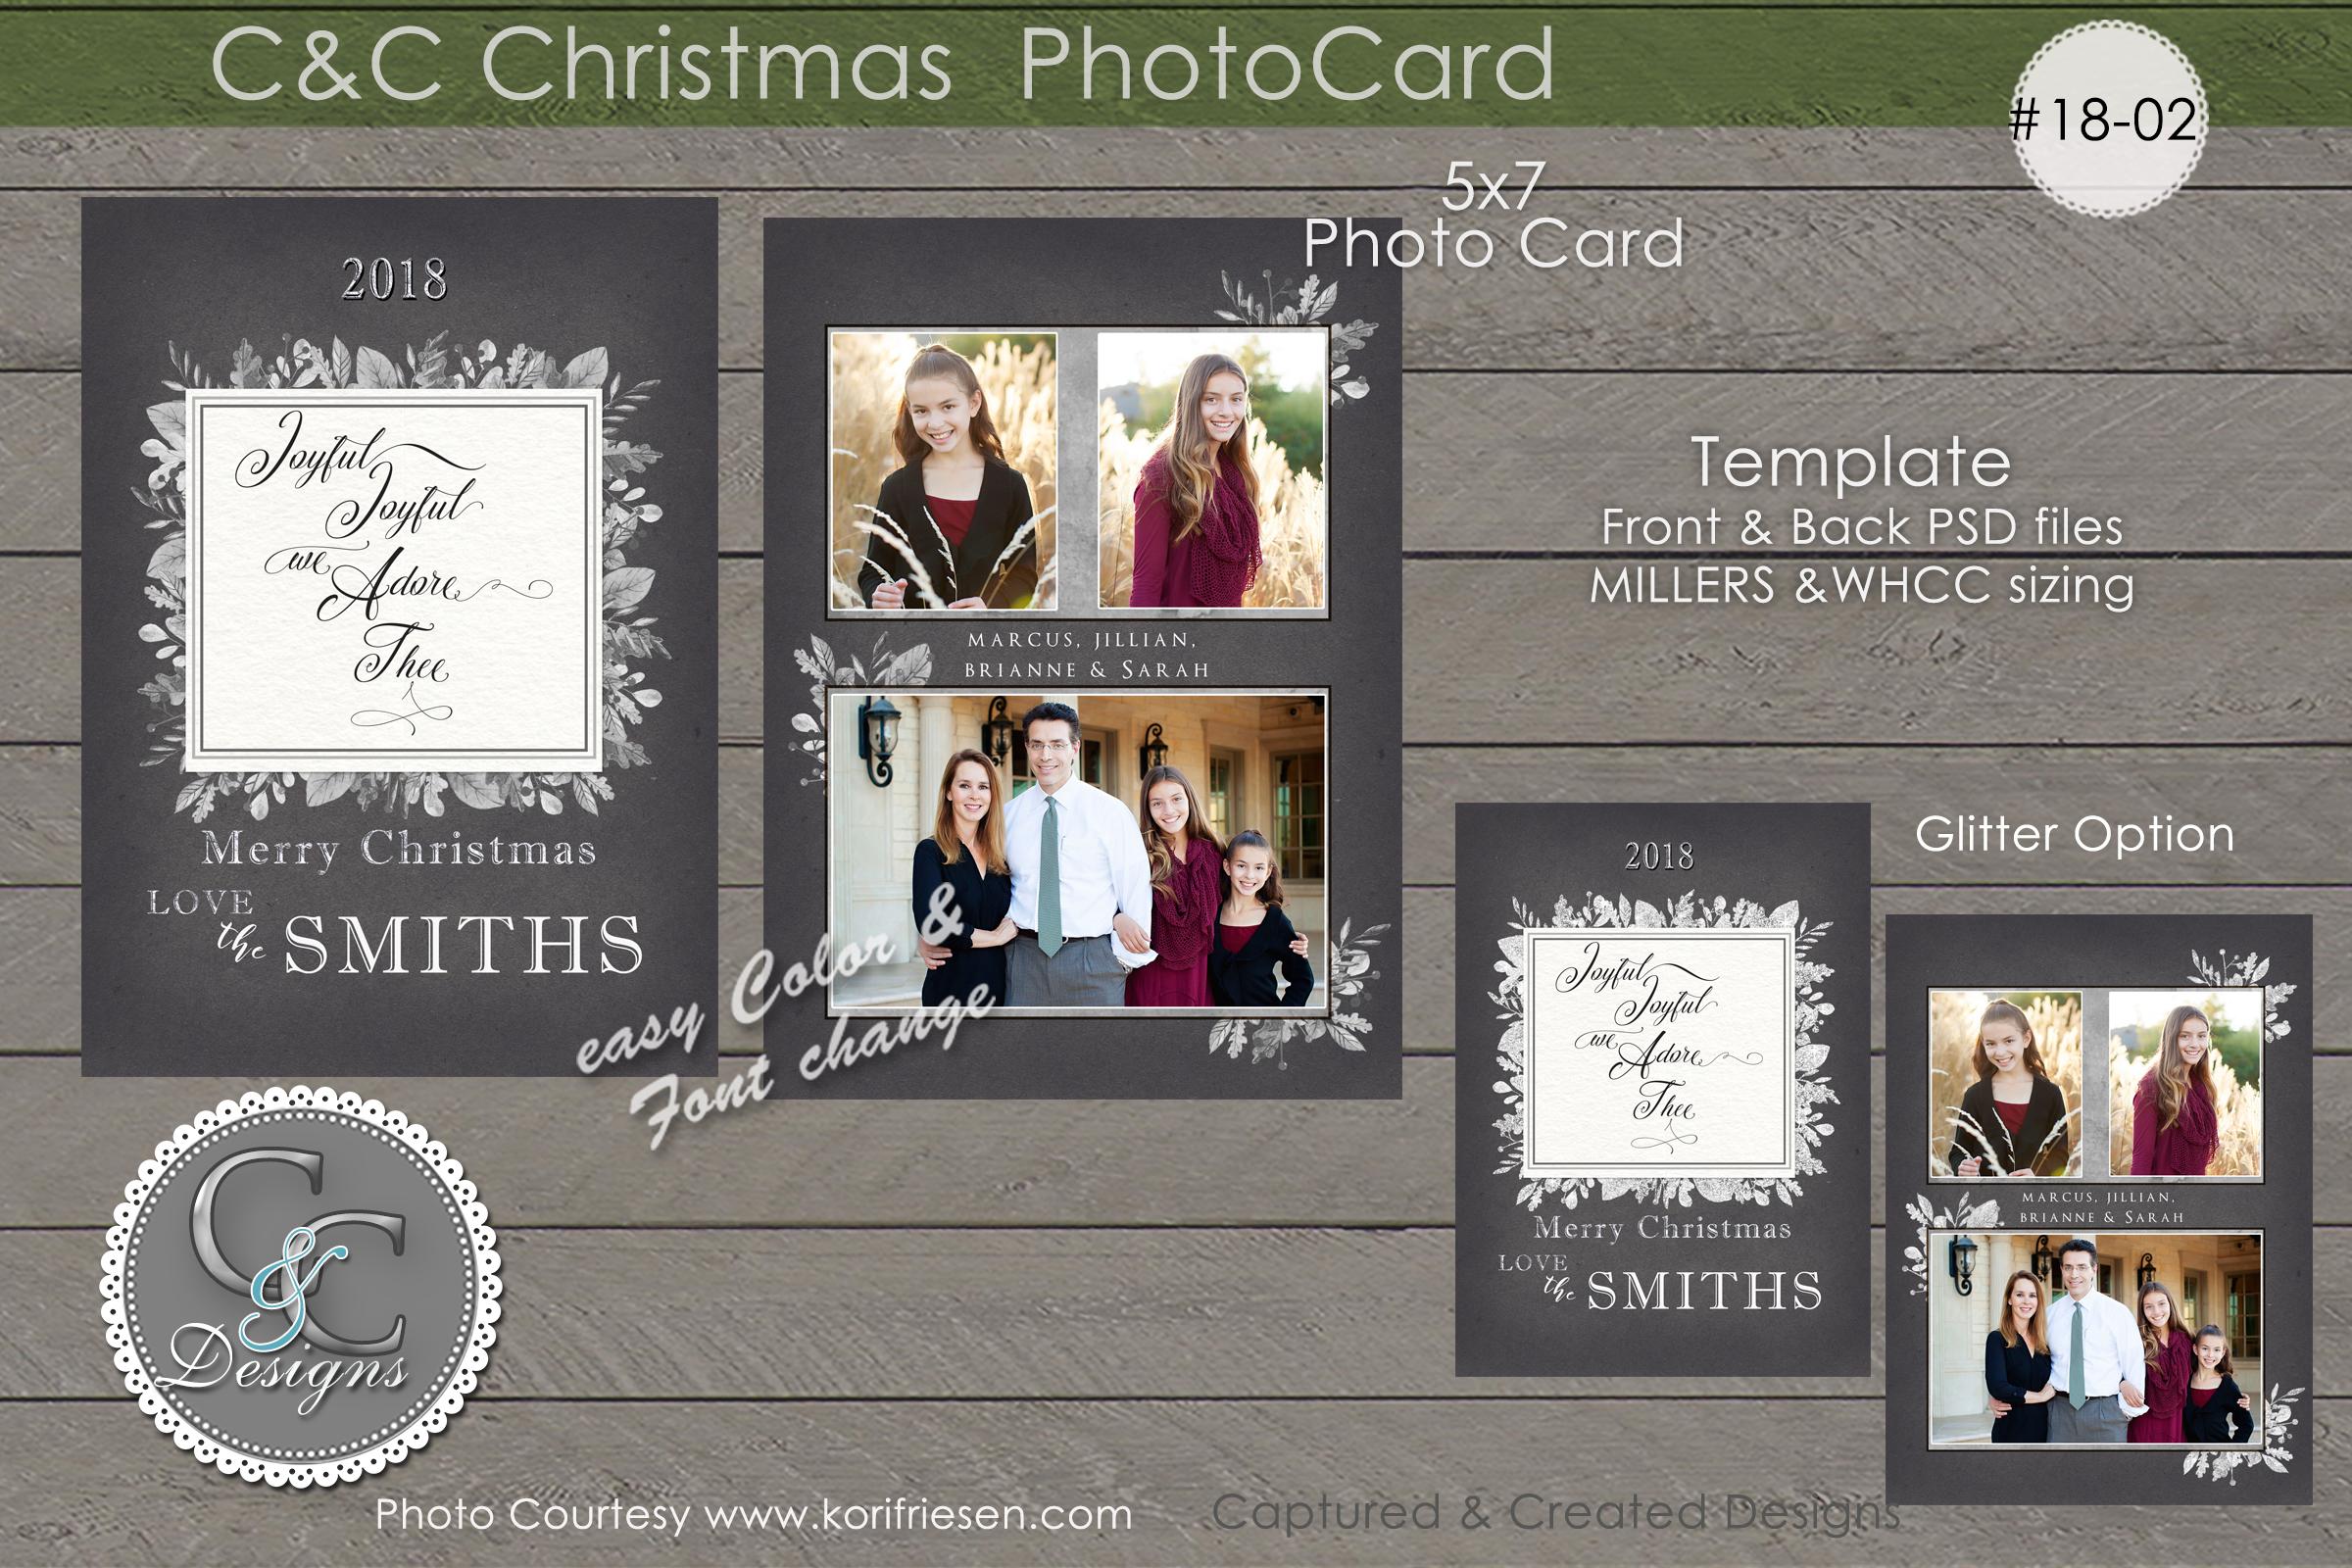 C&C Christmas Photo Card 18-02 example image 1